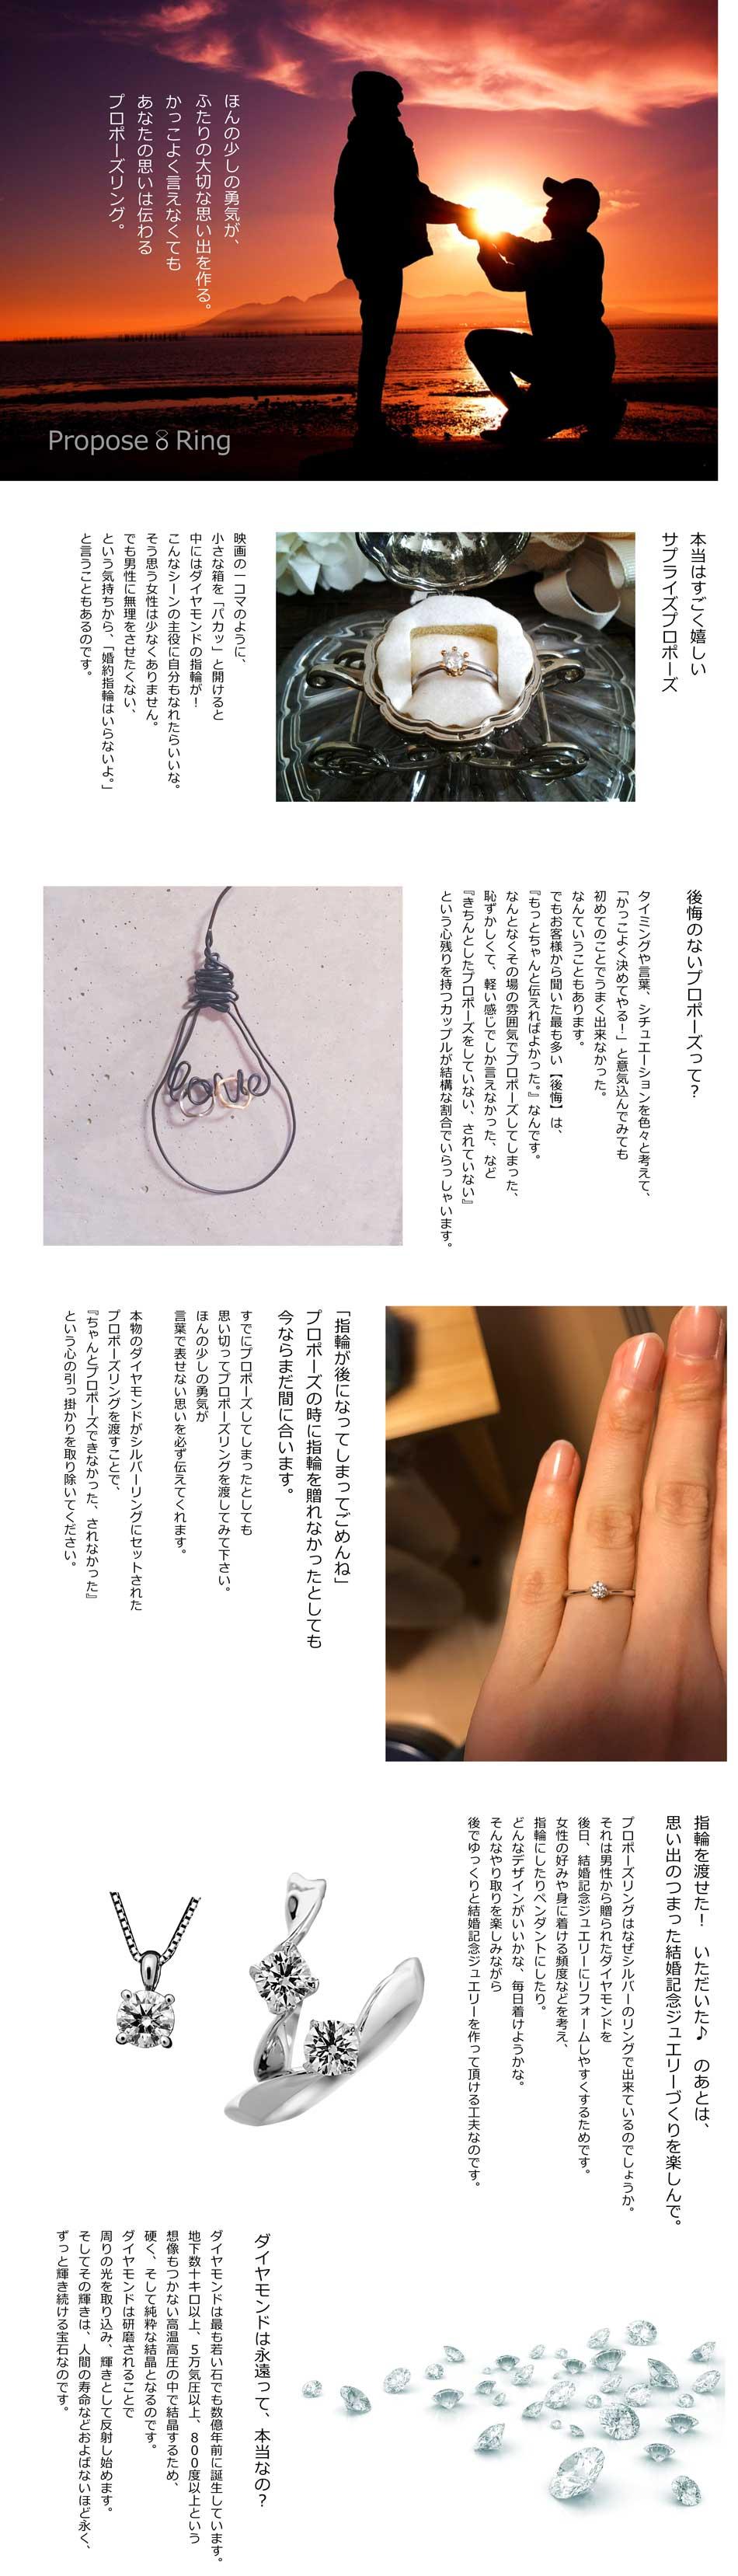 Propose Ring | サプライズプロポーズのための婚約指輪